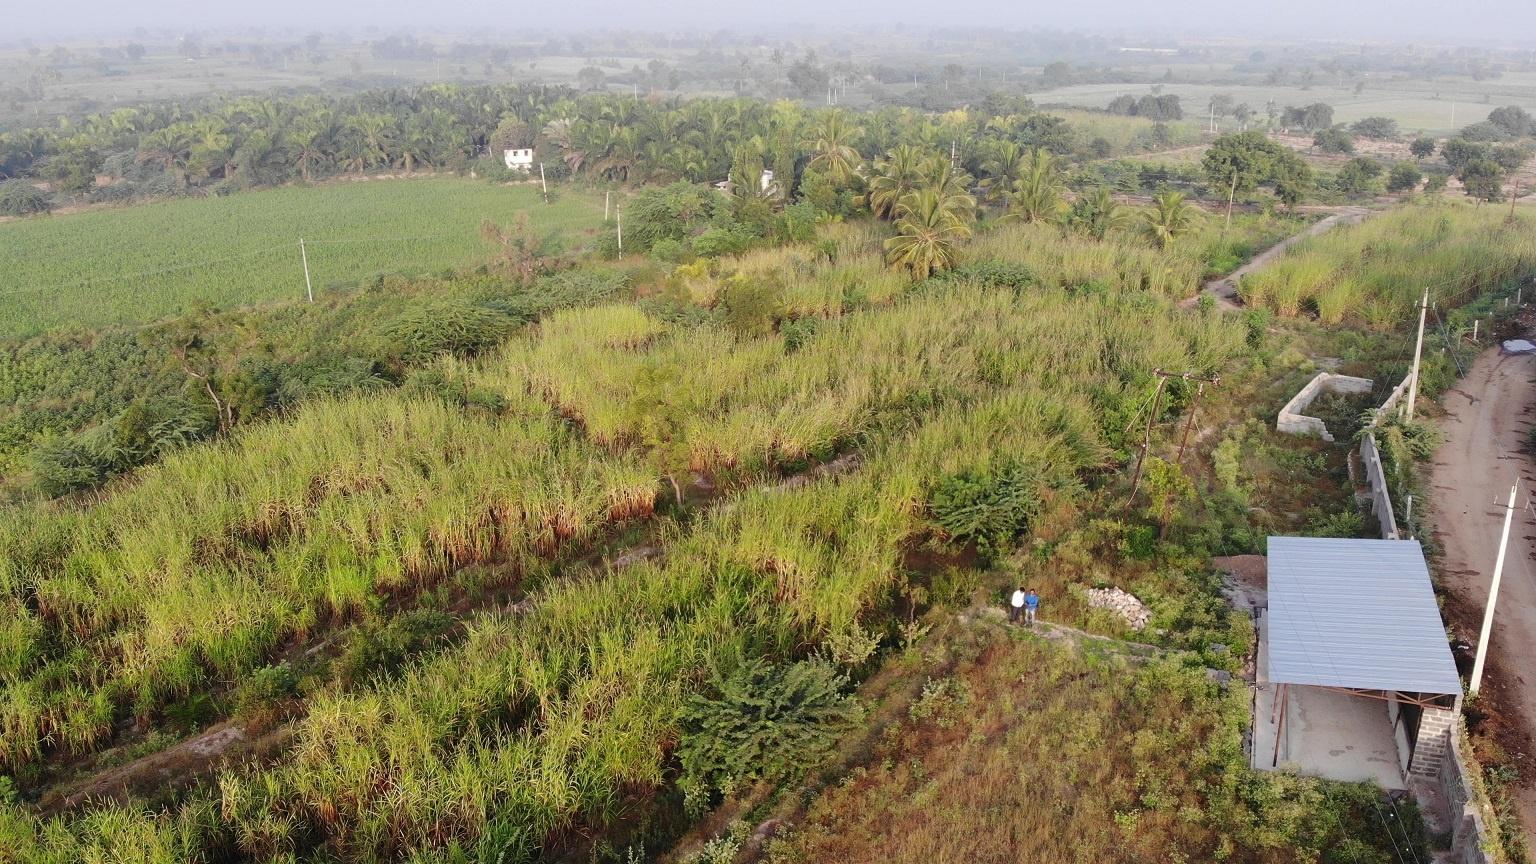 Overview of DEAL organic farm Mevundi Gadag district. April 27, 2020. 13.34.